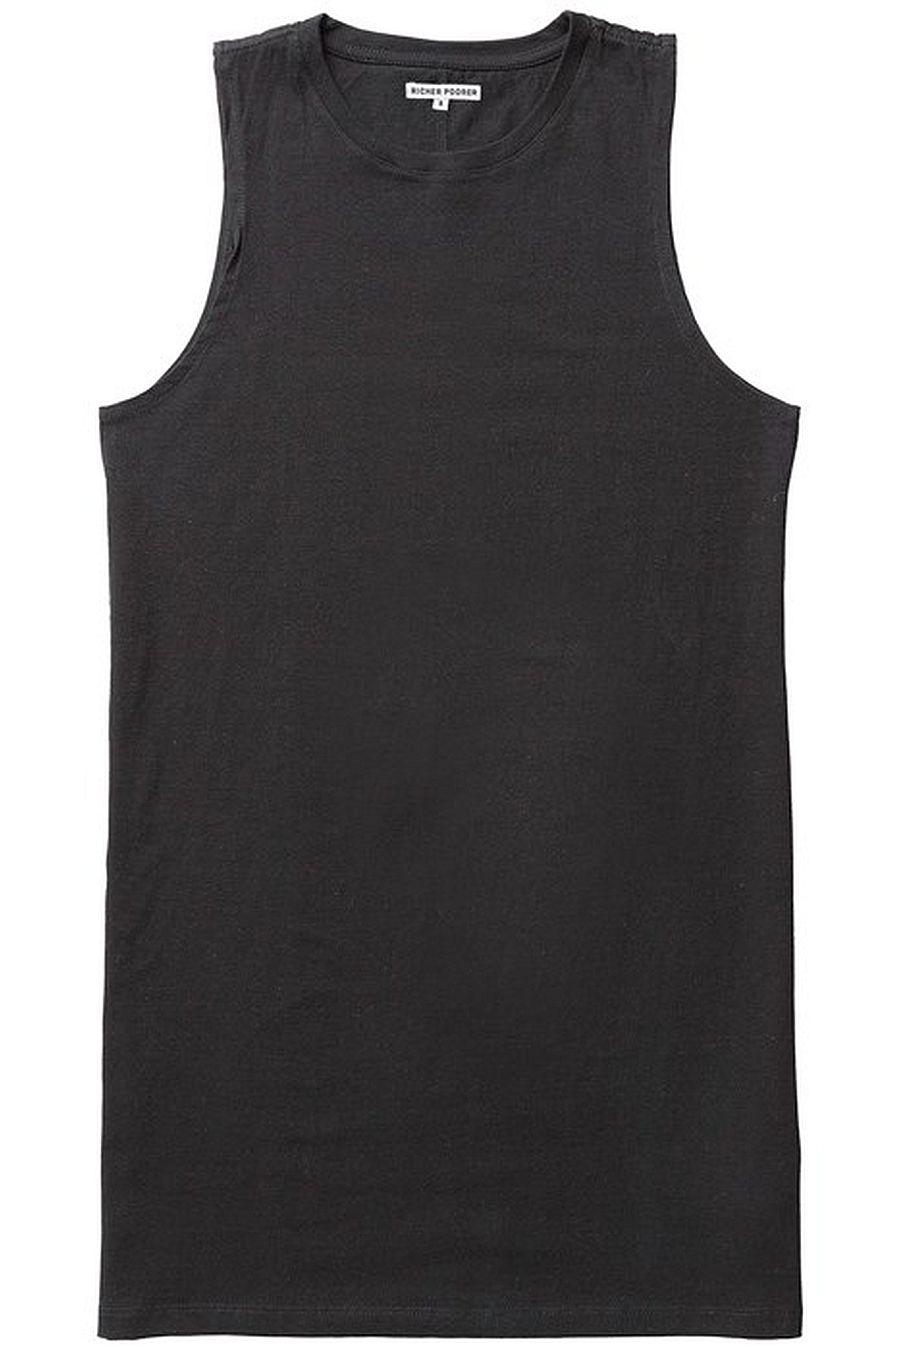 Richer Poorer Women's Tank Dress - Black